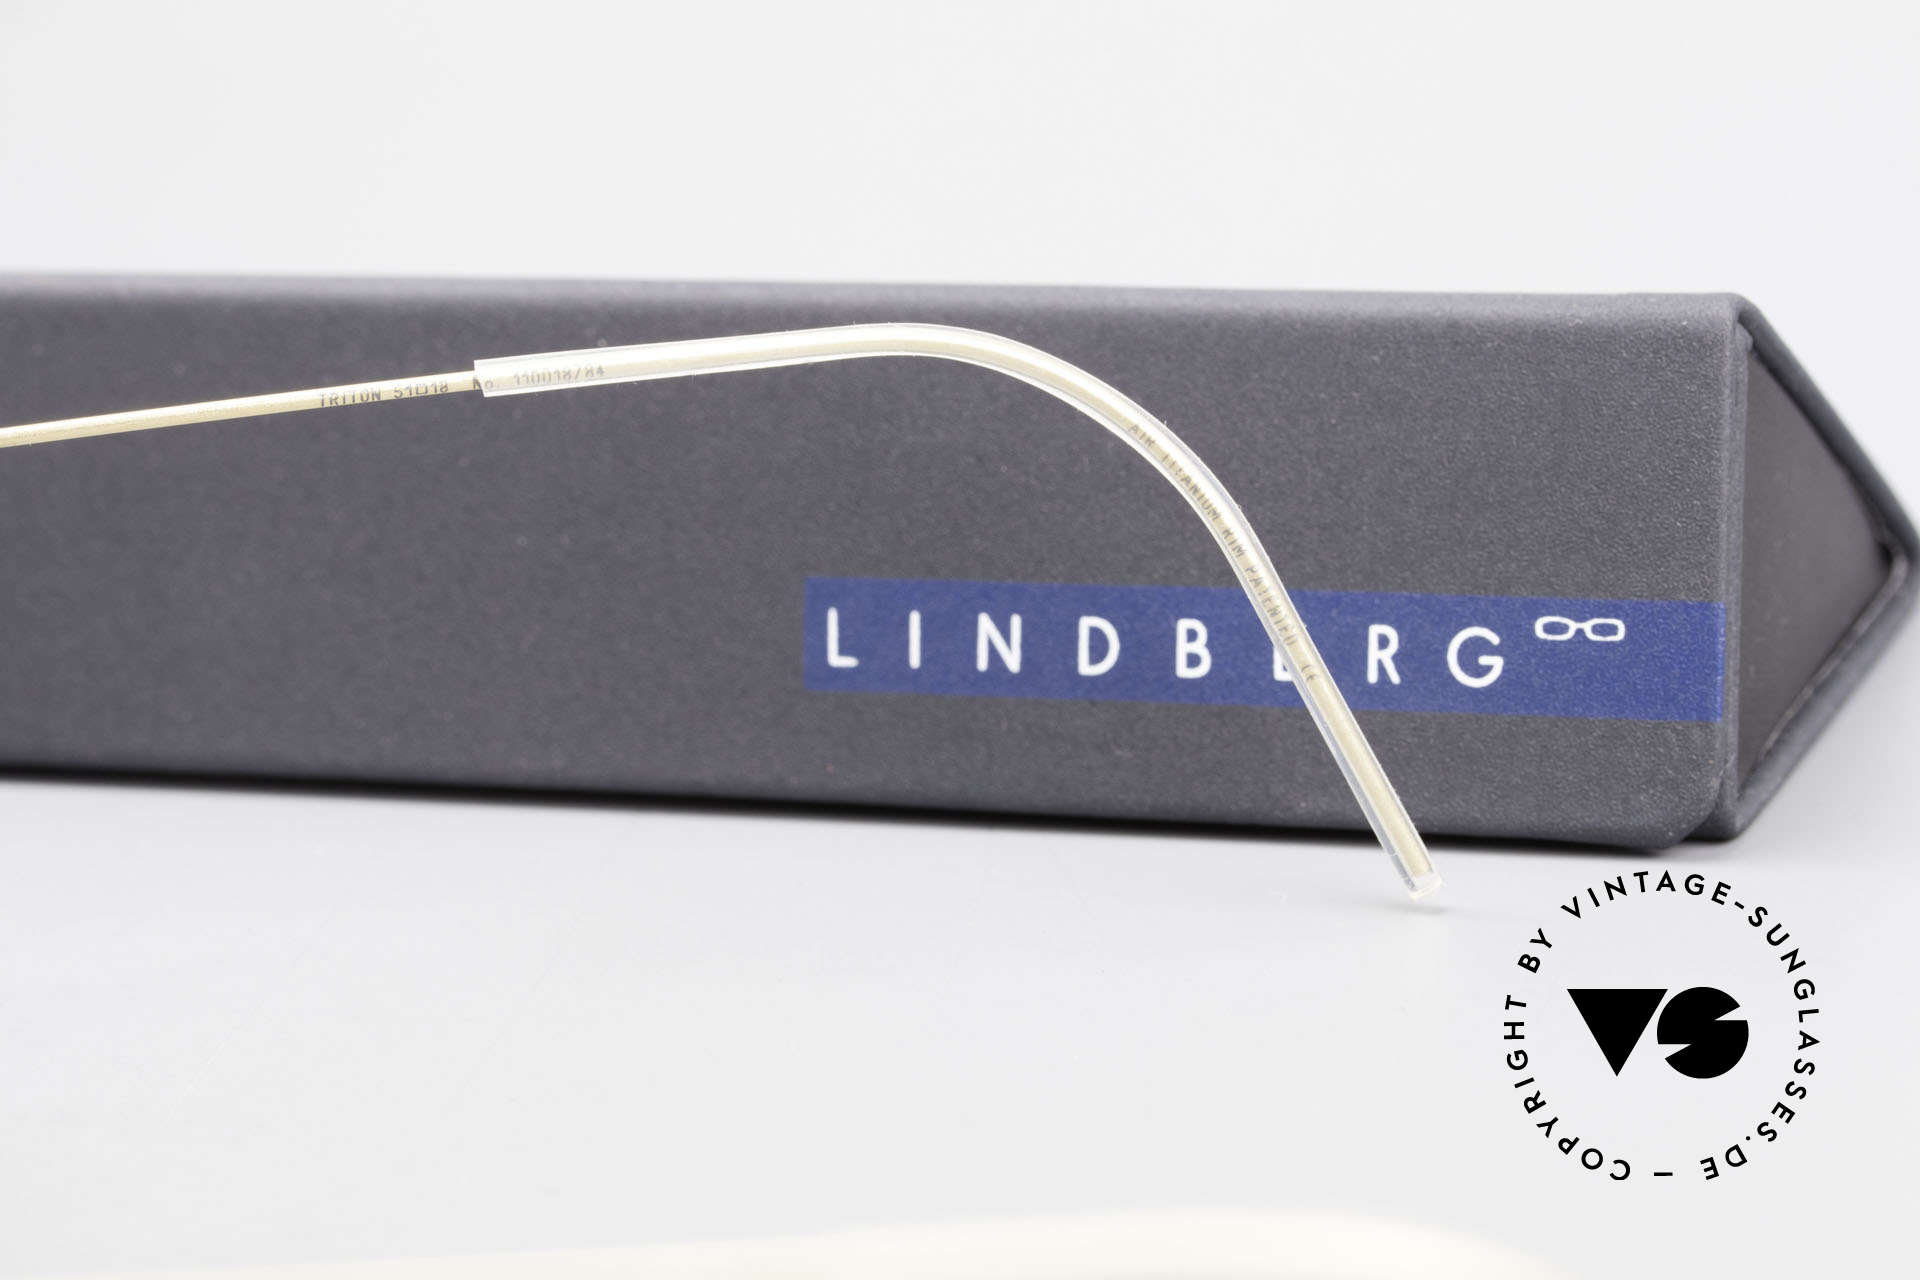 Lindberg Triton Air Titan Rim Titan Frame Acetate Inner Rim, Size: medium, Made for Men